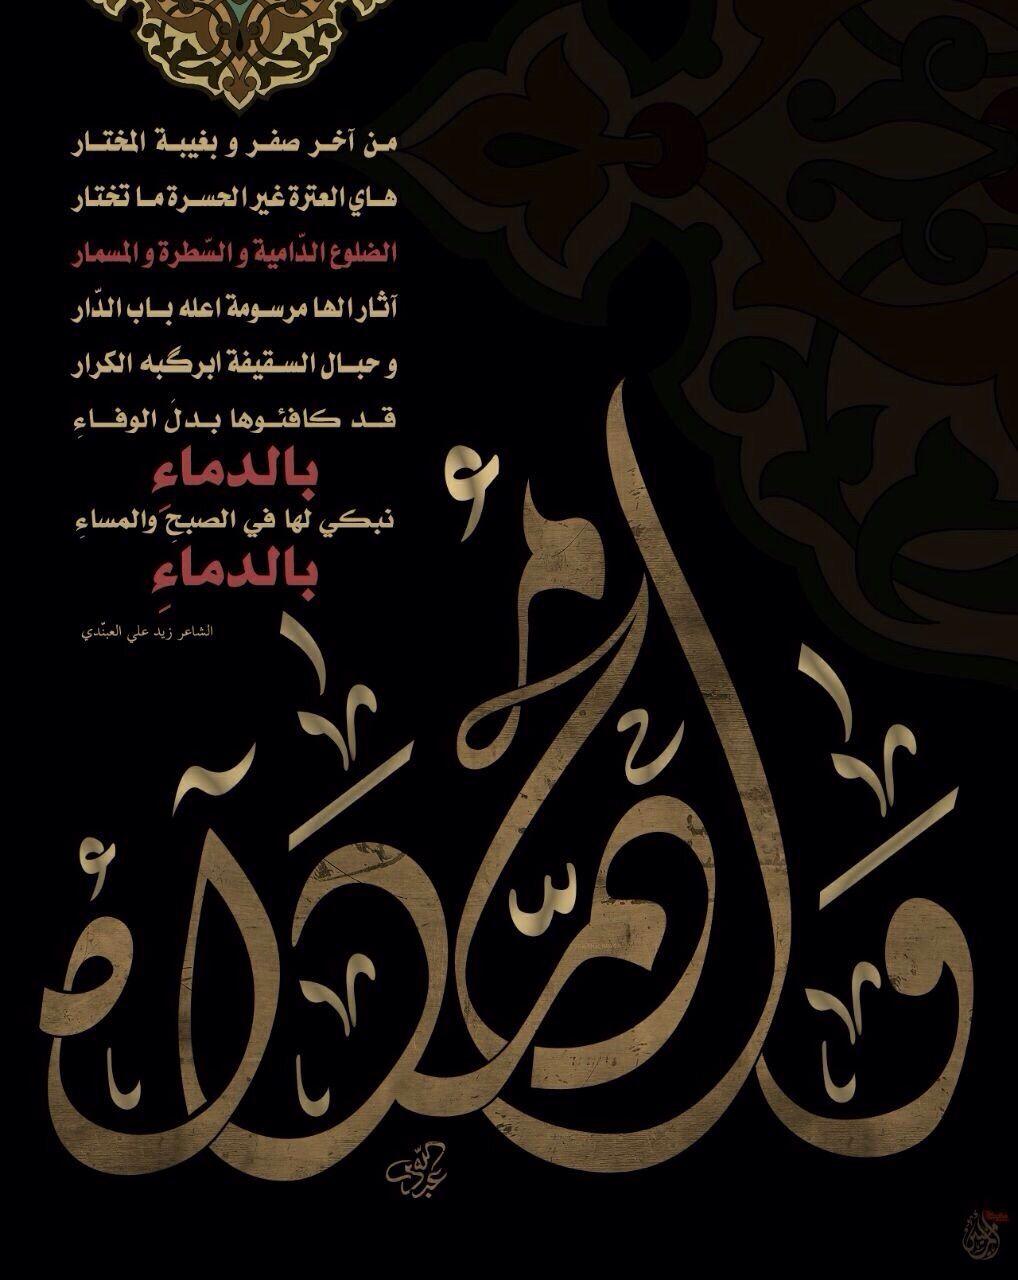 Pin By Shirayuki 25 On قالوا٣ Arabic Calligraphy Calligraphy Milad Ul Nabi